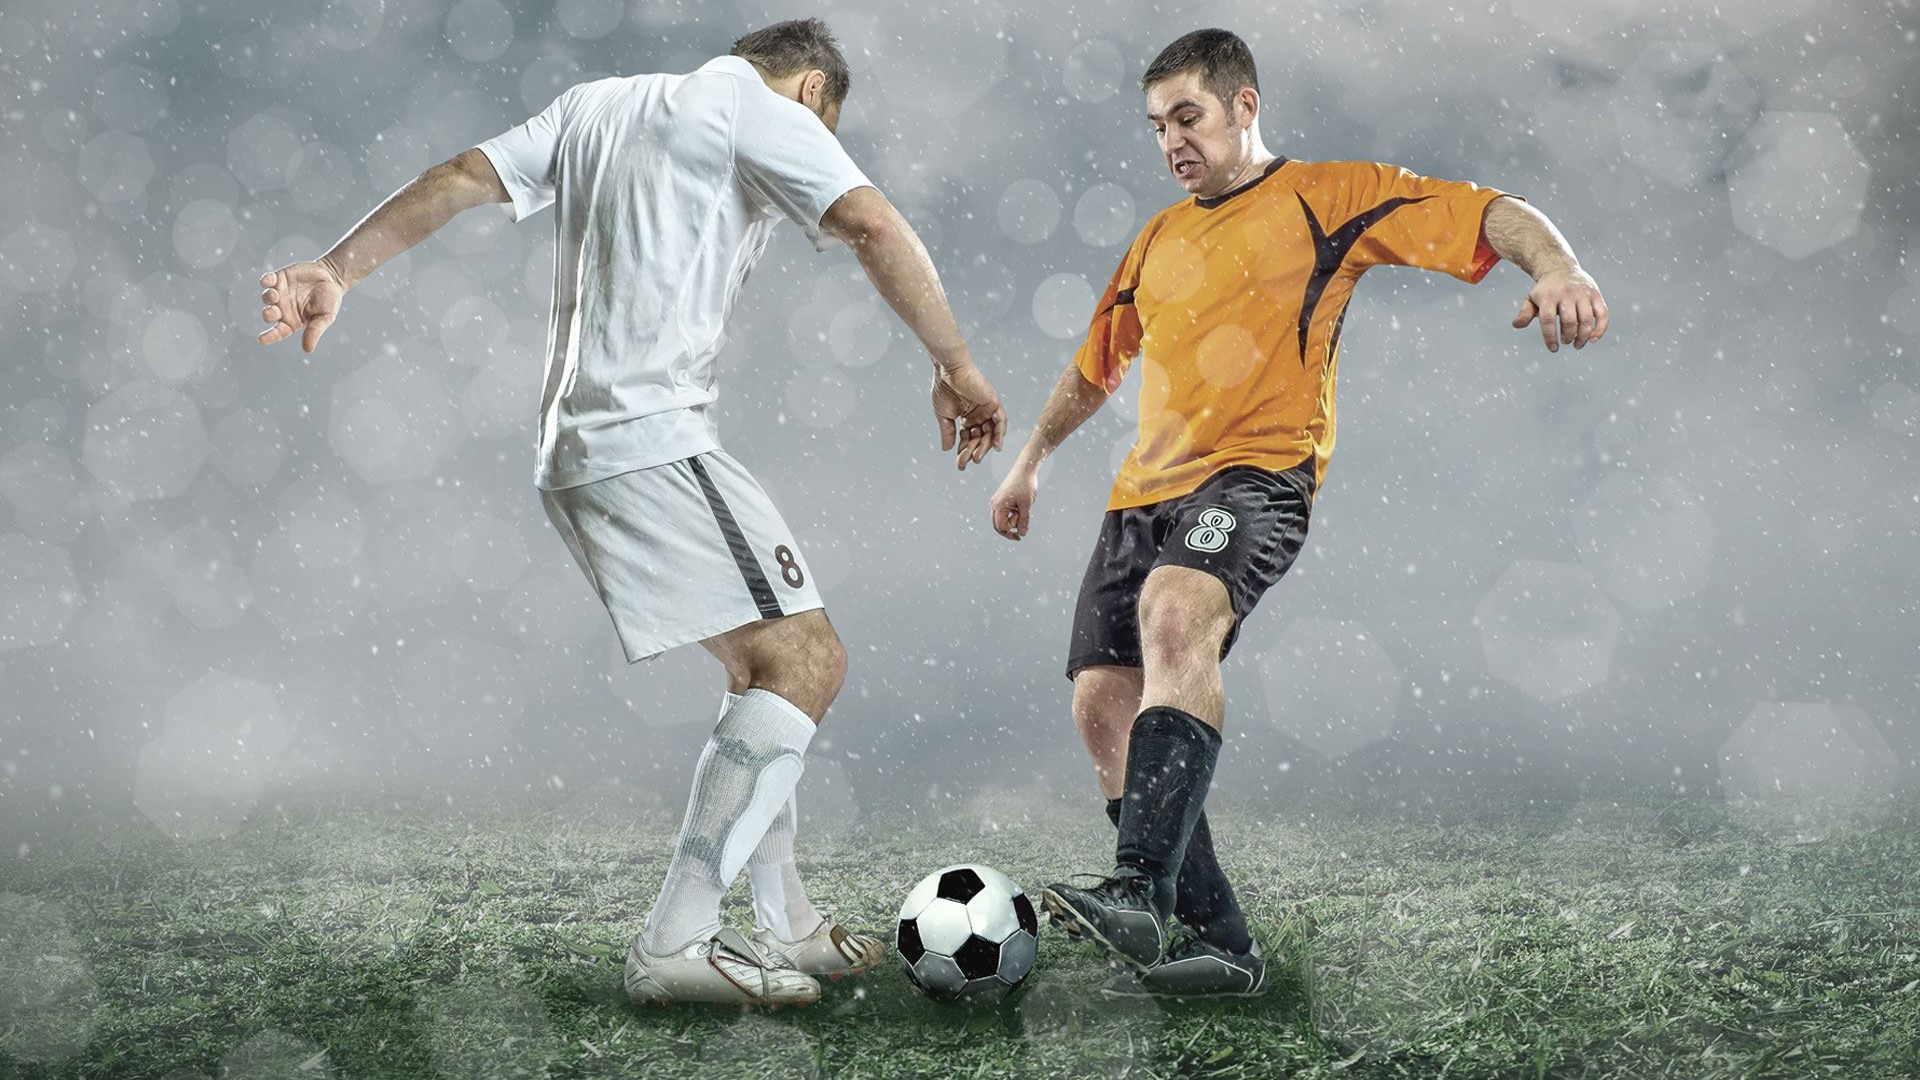 crusaders-vs-cheetahs-rugby-live